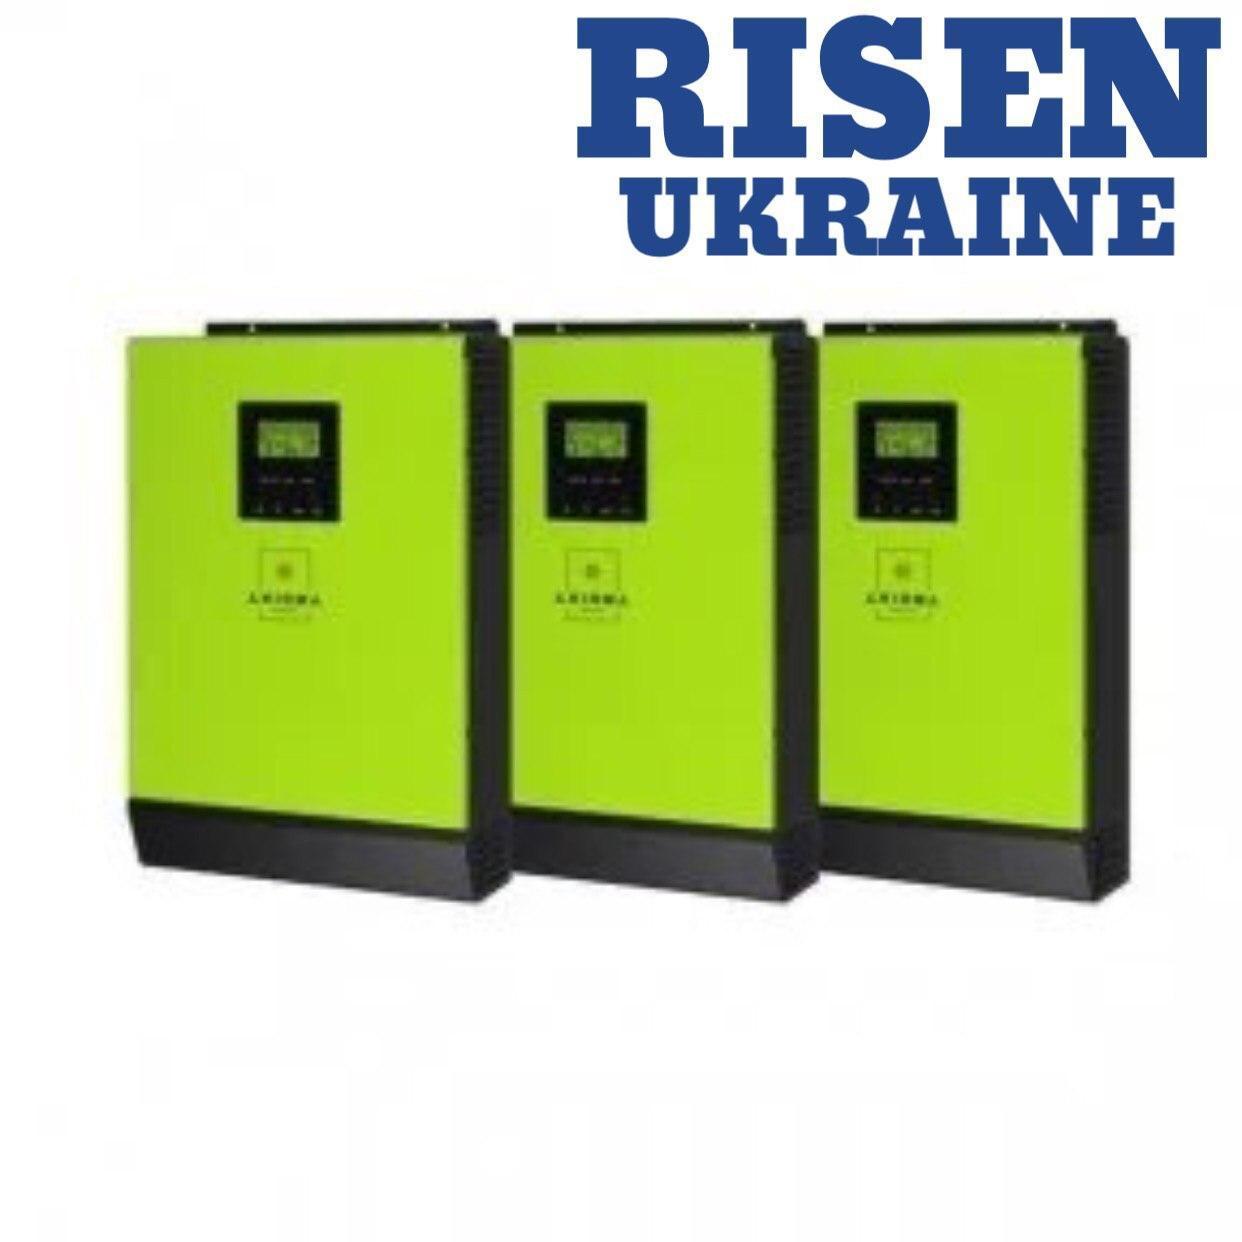 Інвертори гібридні 12кВт AXIOMA energy - ISGRID 4000 3 шт по 4кВт